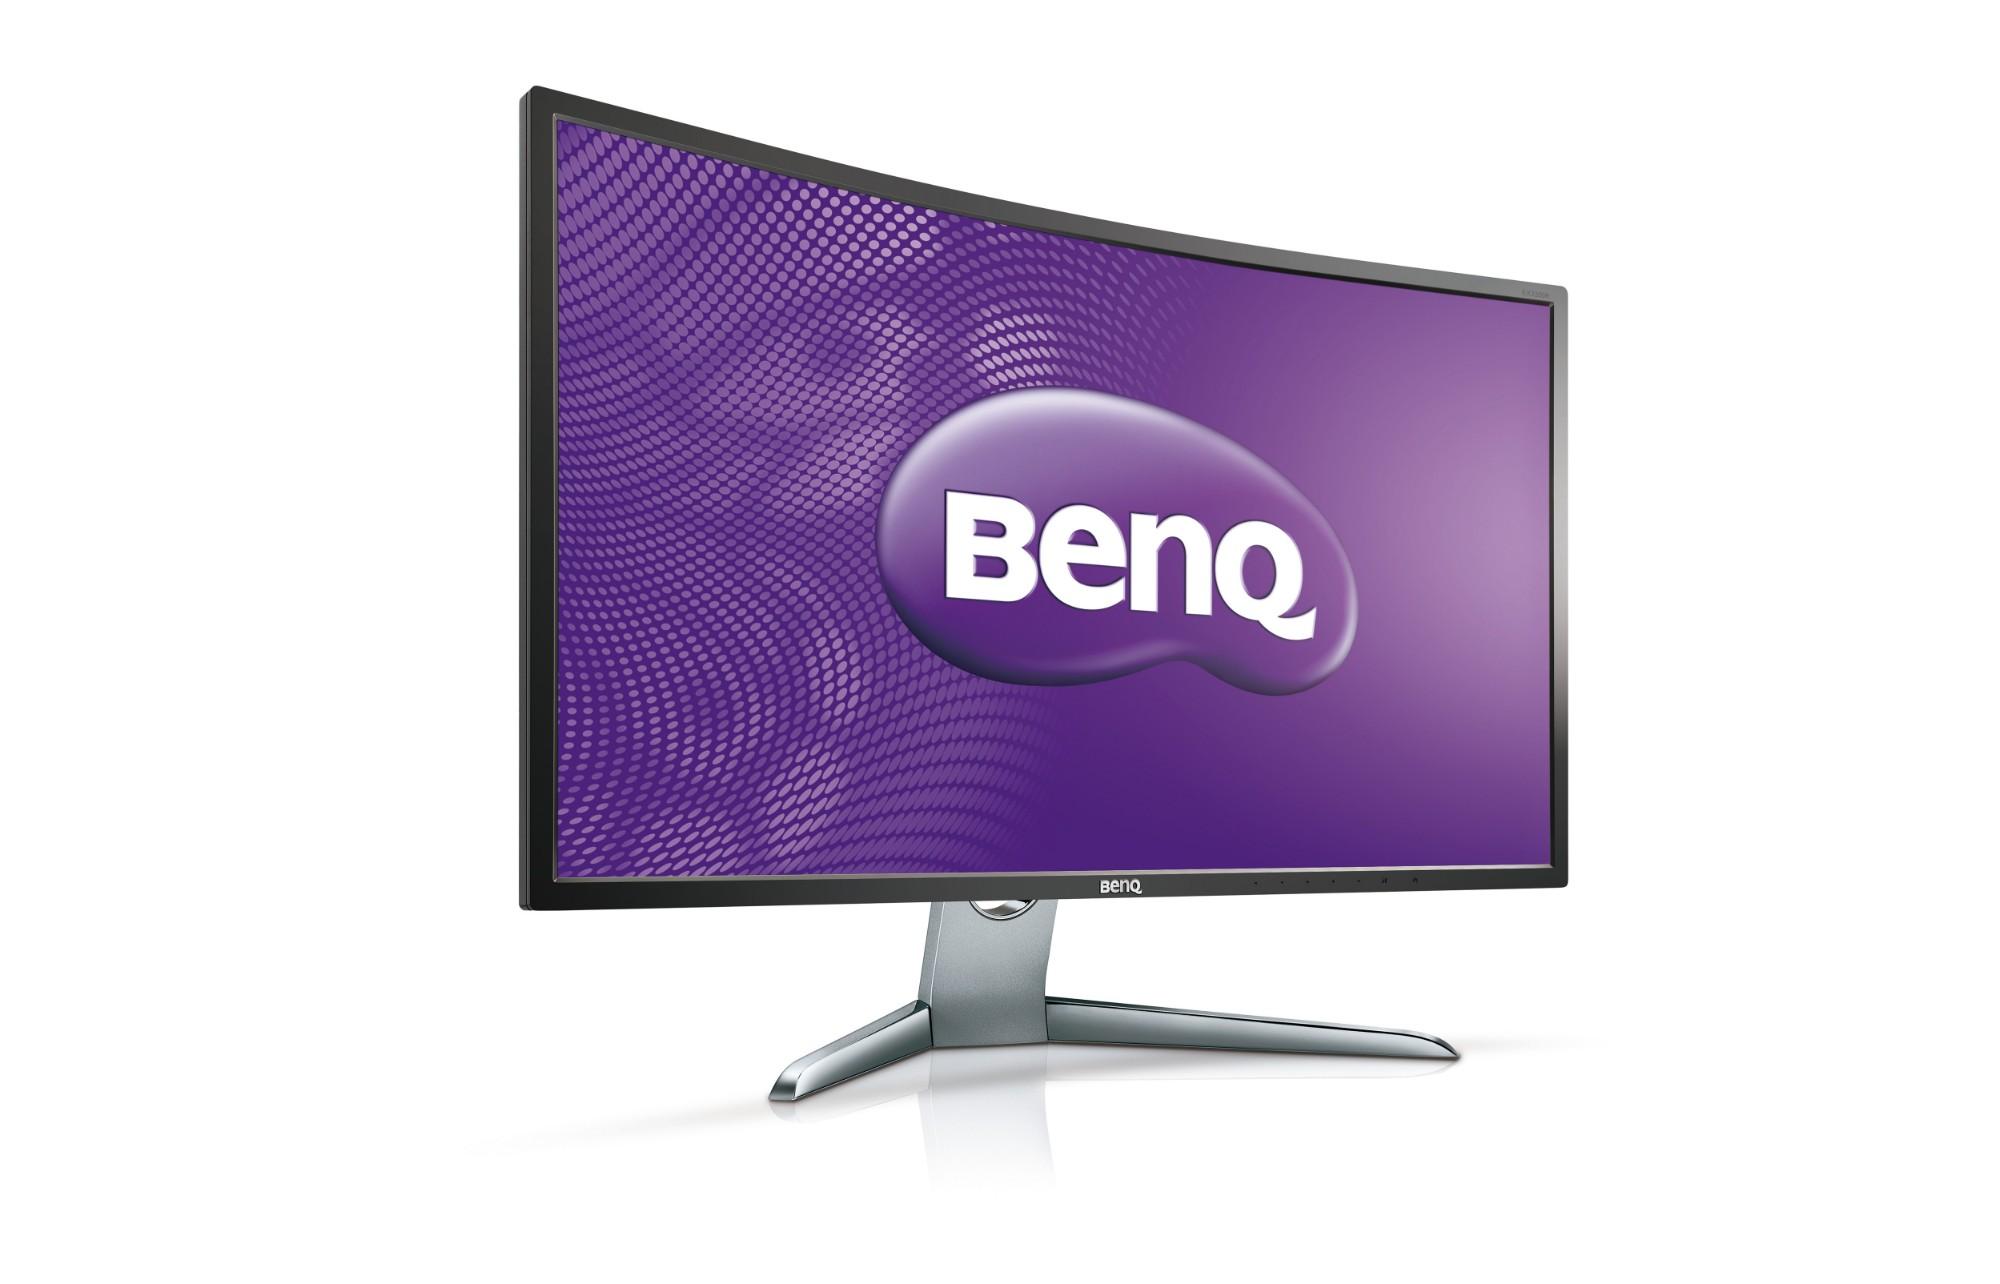 "Benq EX3200R LED display 80 cm (31.5"") Full HD Curved Black,Silver"